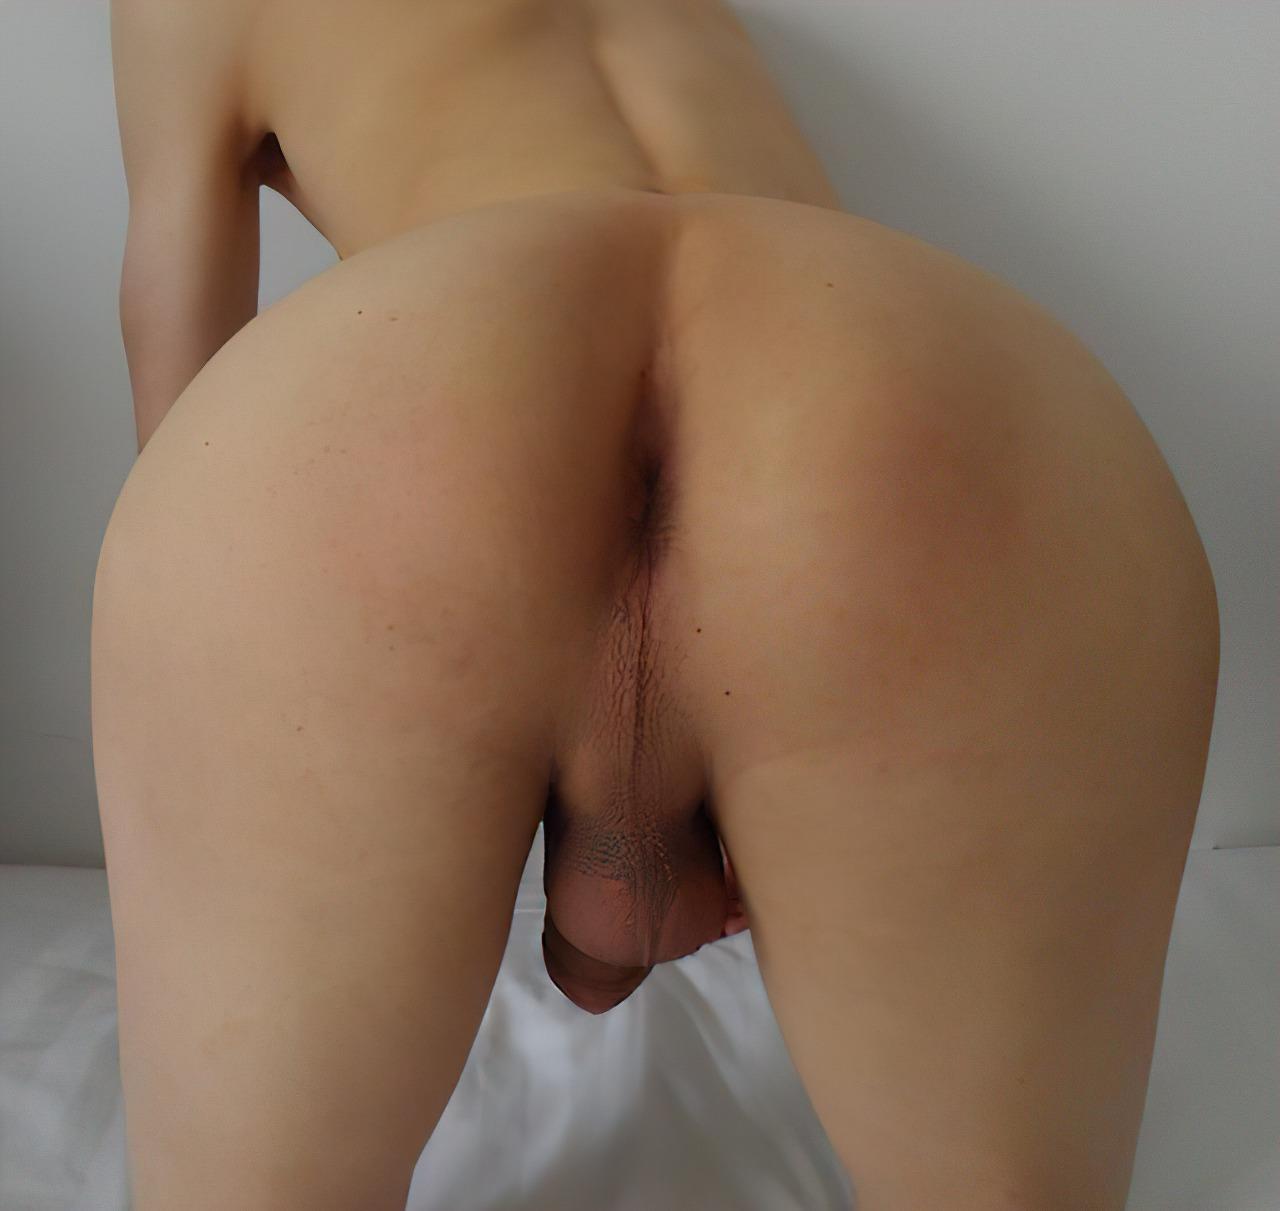 travestis fotos swing amador